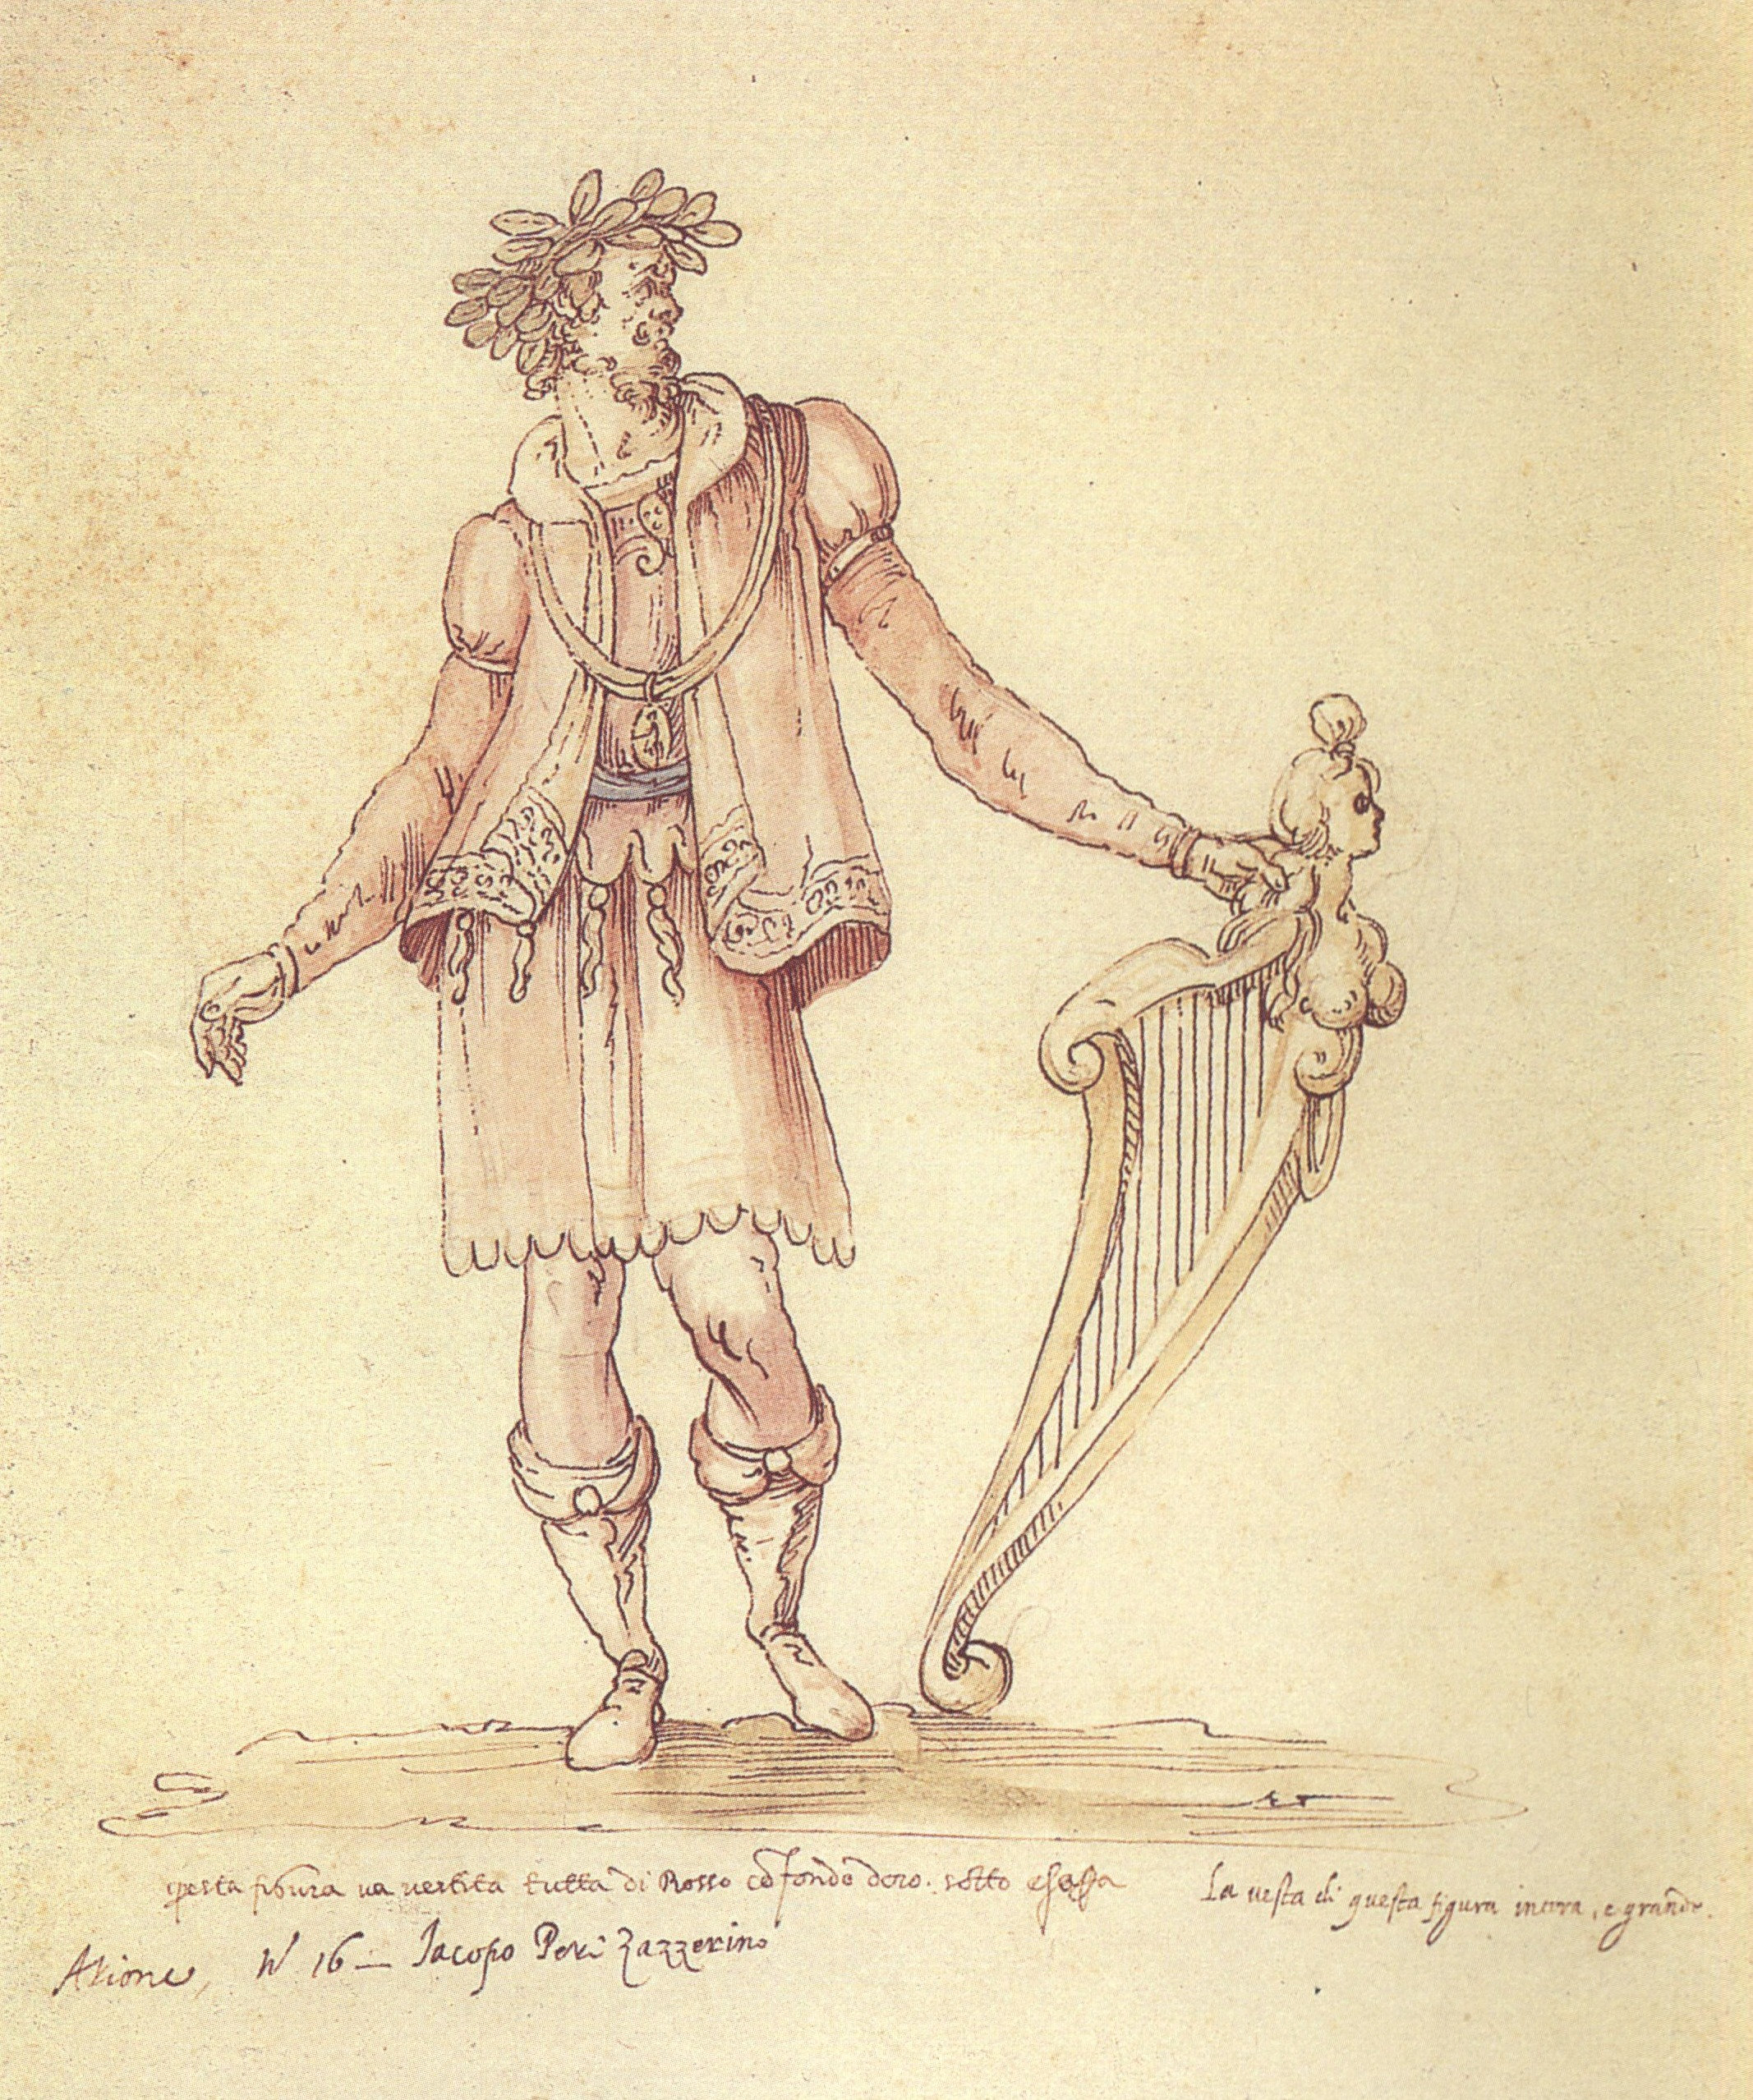 File:Jacopo Peri 1.jpg